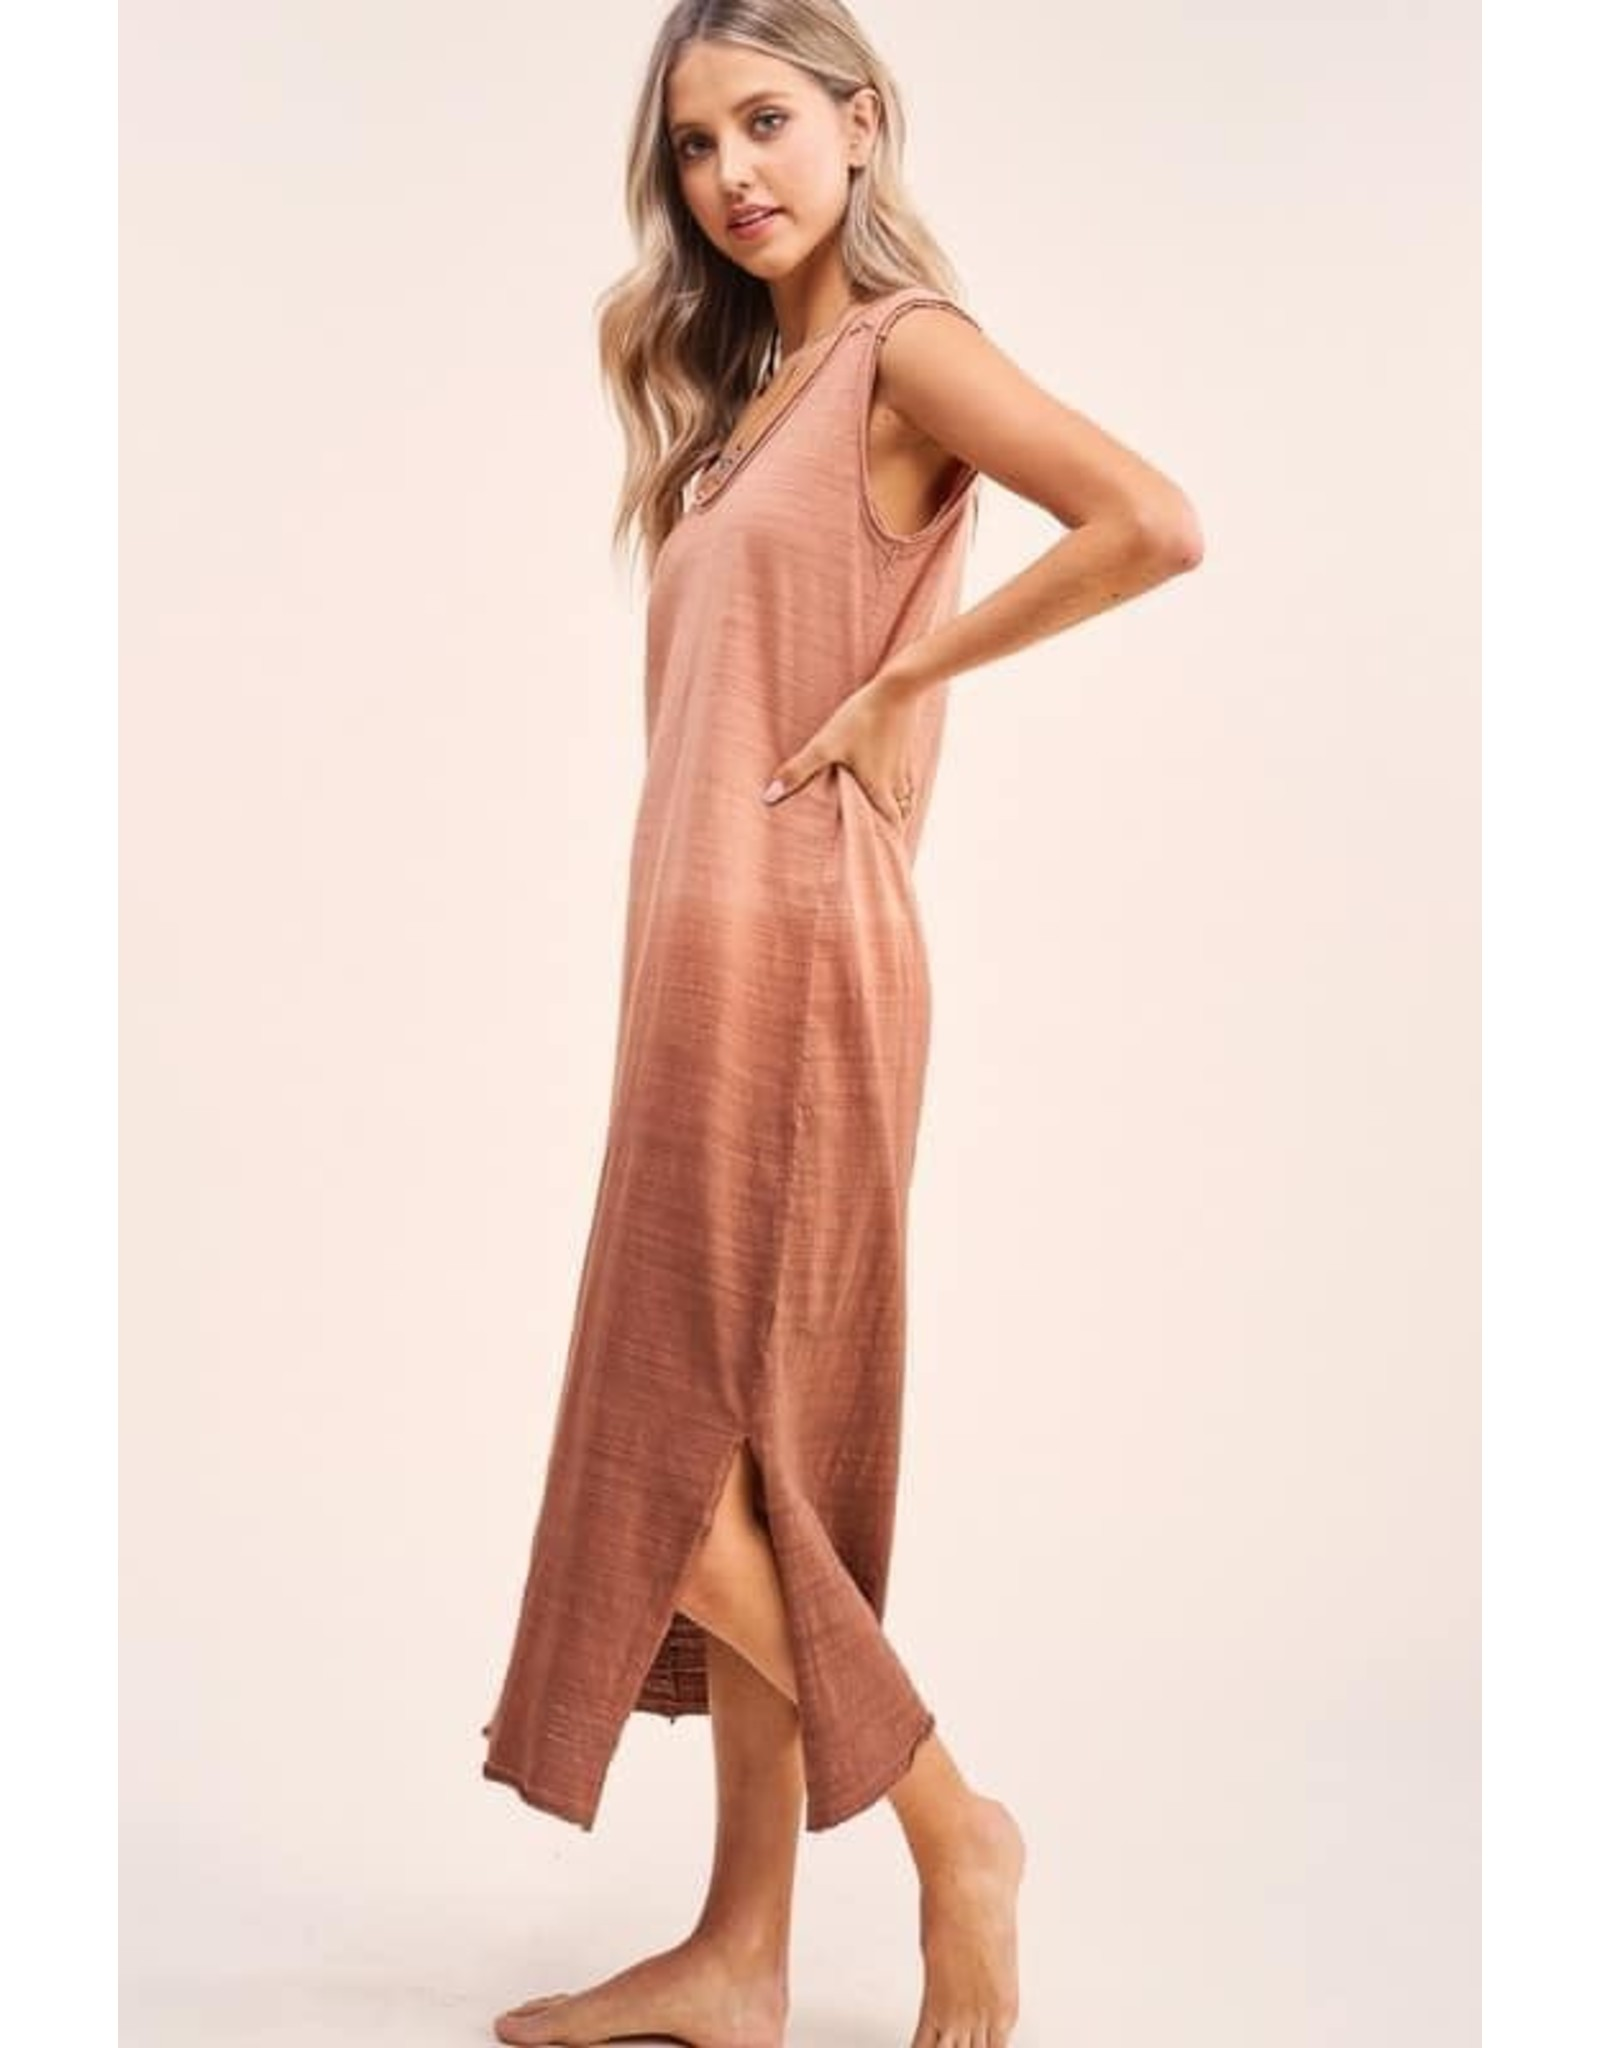 Kensley Dress